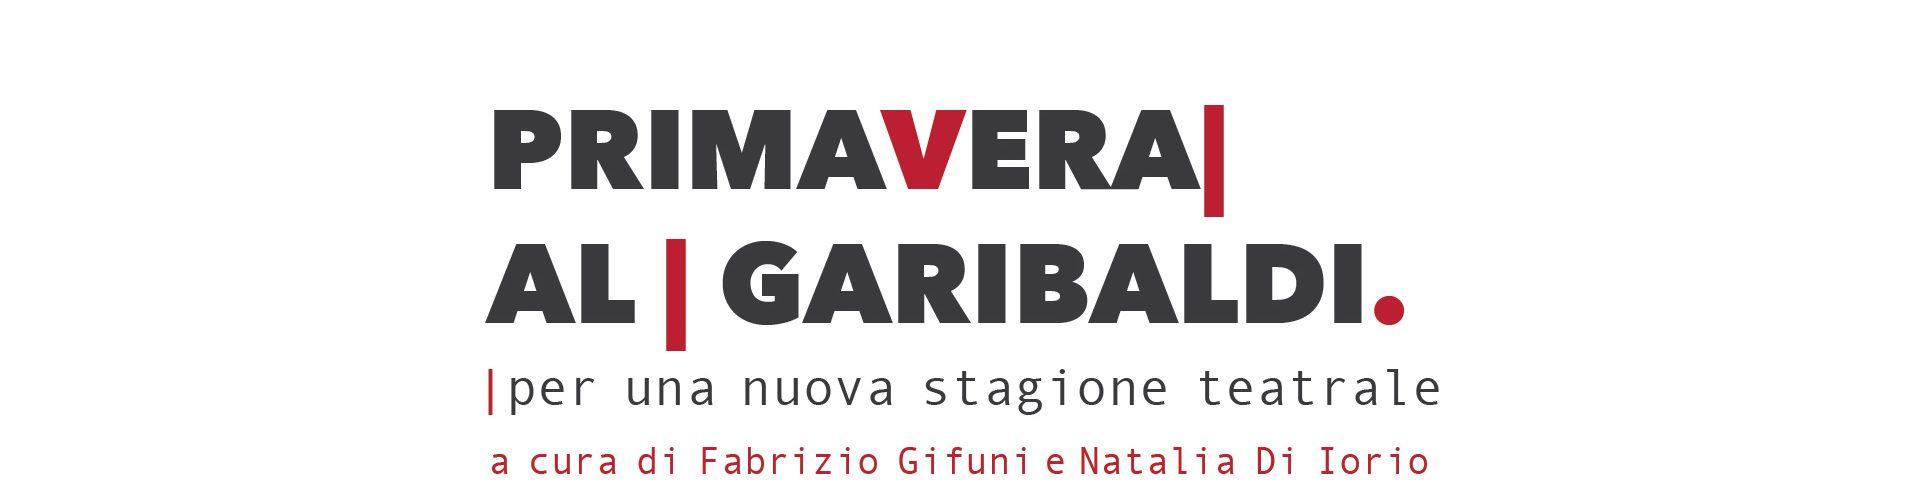 PrimaVera al Garibaldi